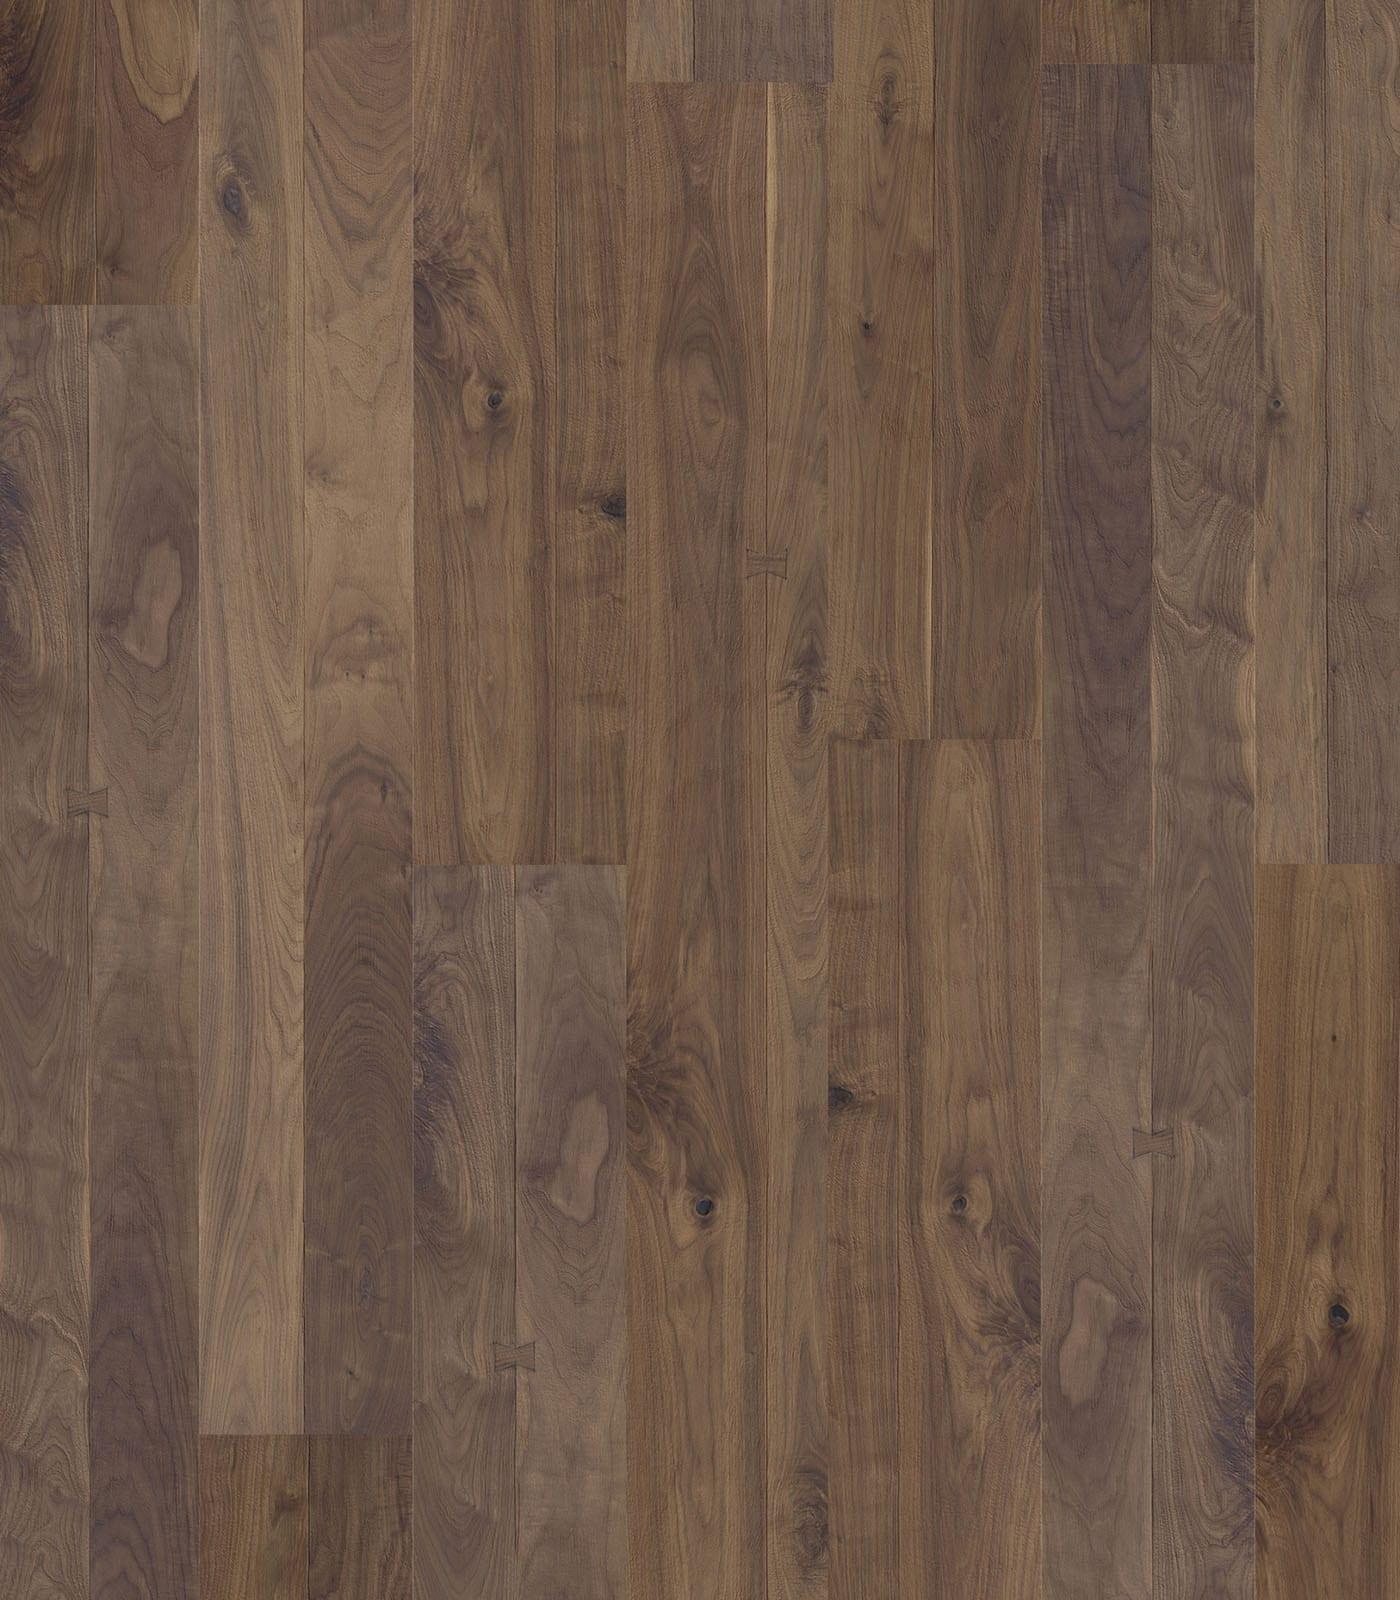 Schonbrunn-Heritage Collection-Walnut engineered floors-flat